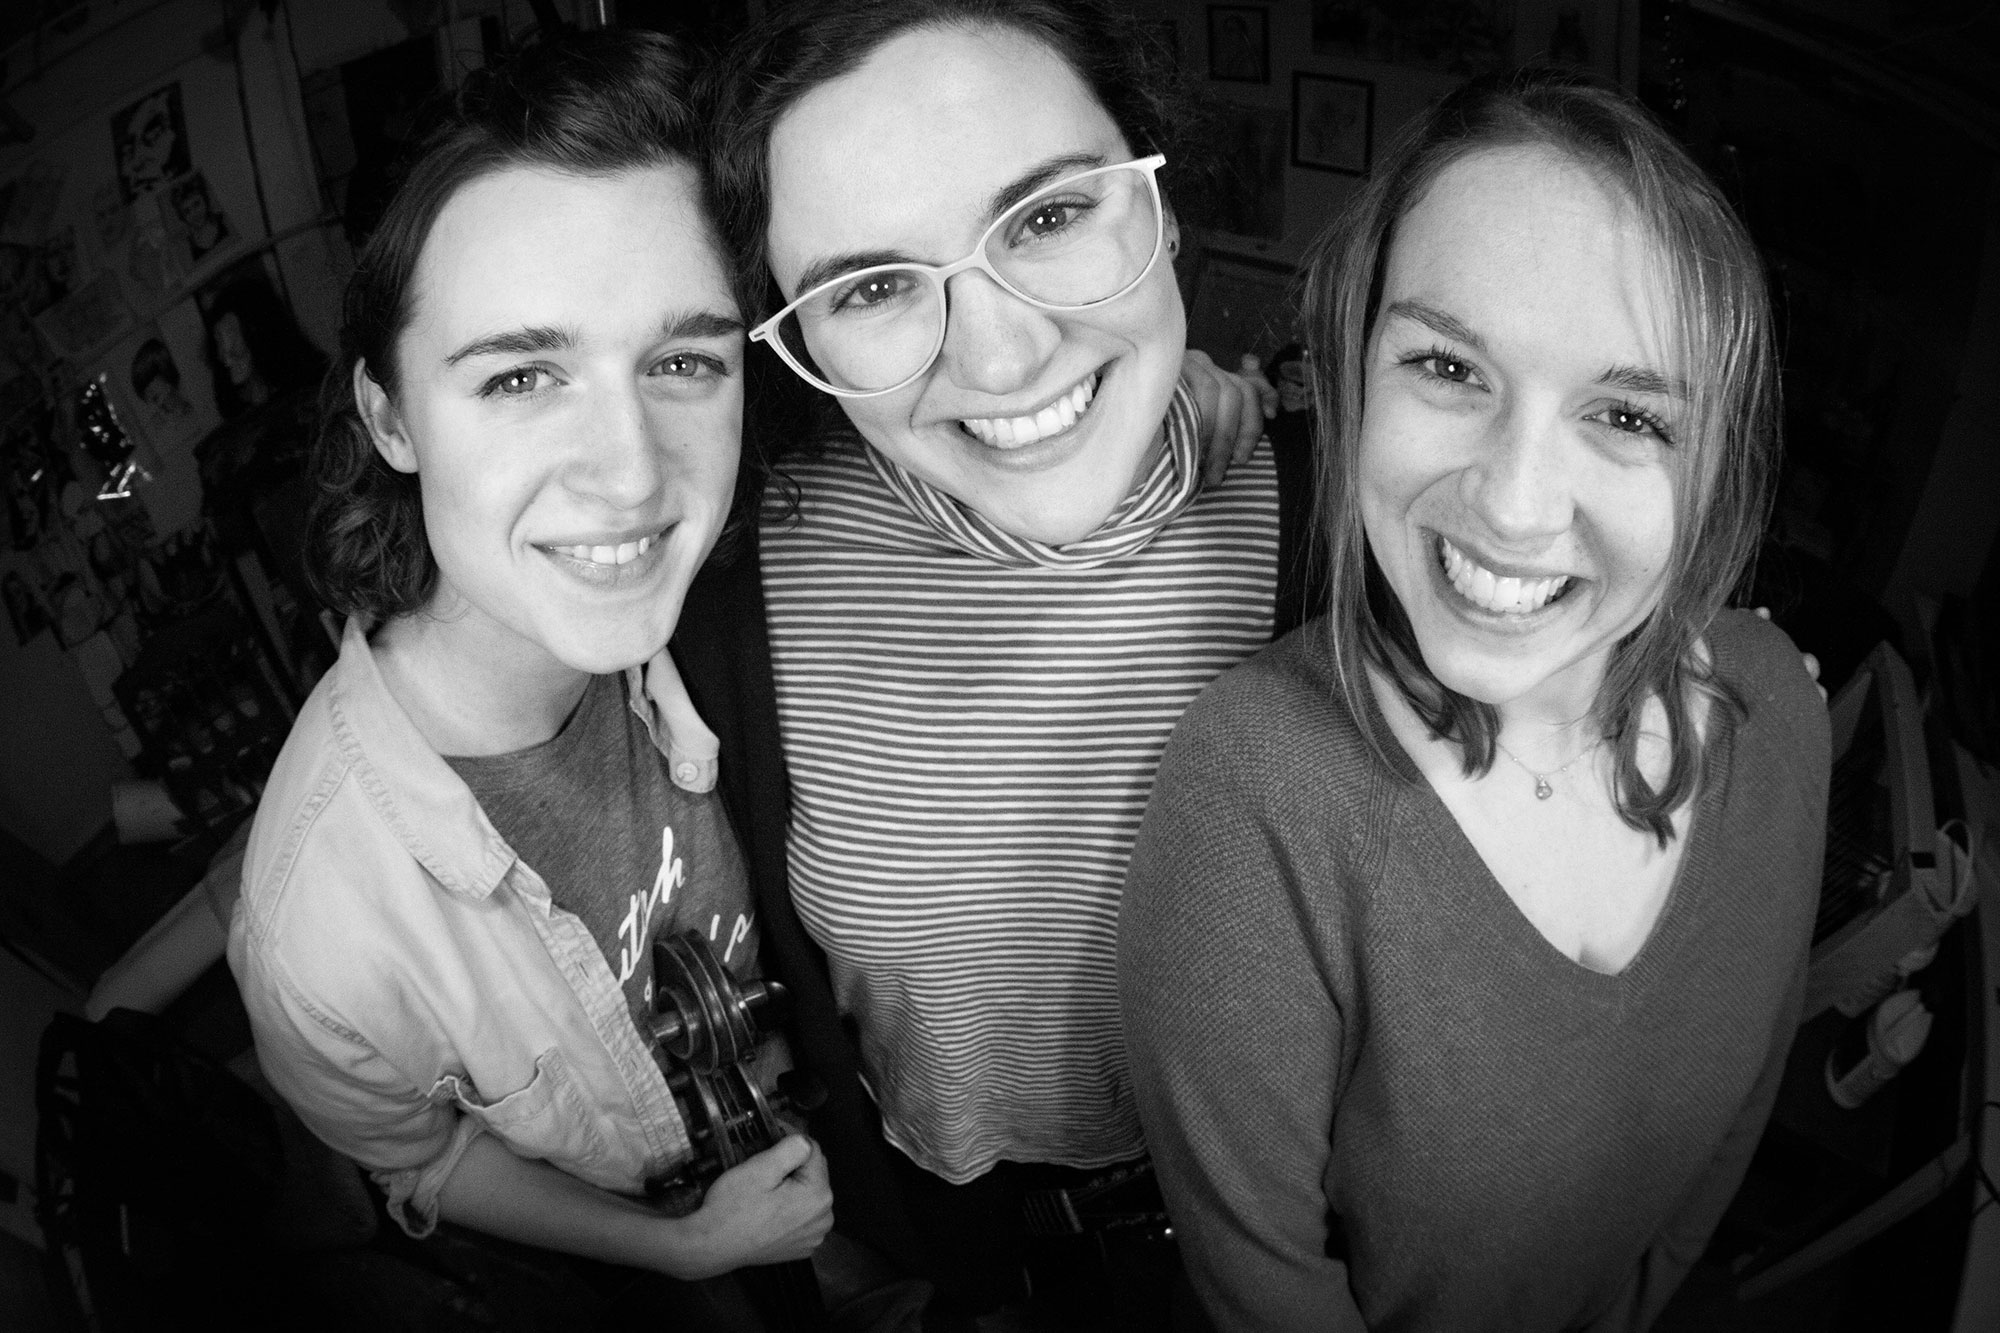 Cleo, Hannah, and Julia